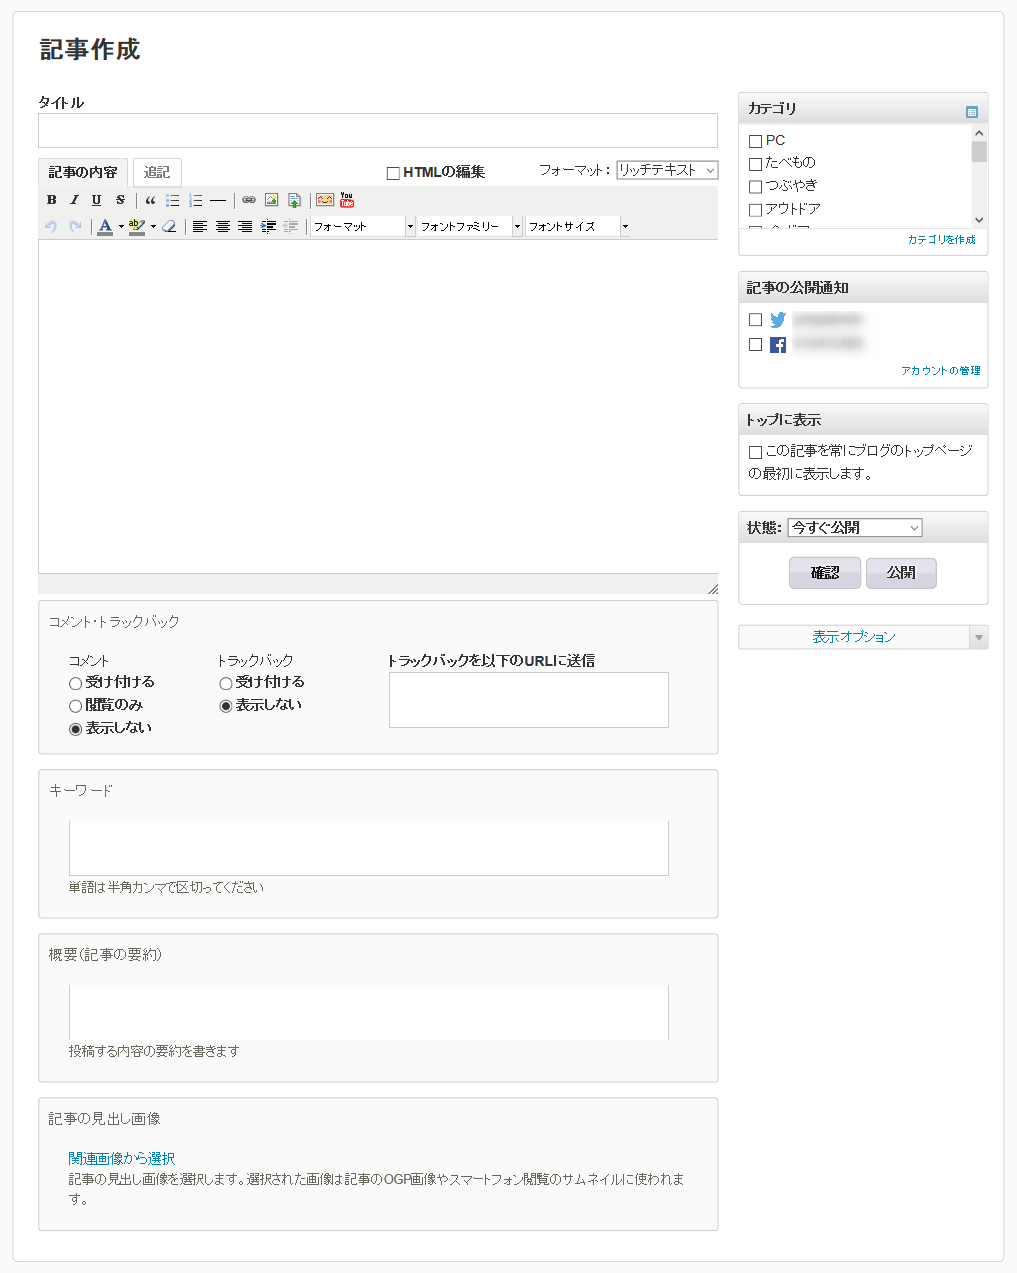 https://www.sixapart.jp/lekumo/bb/support/assets/entries01.png